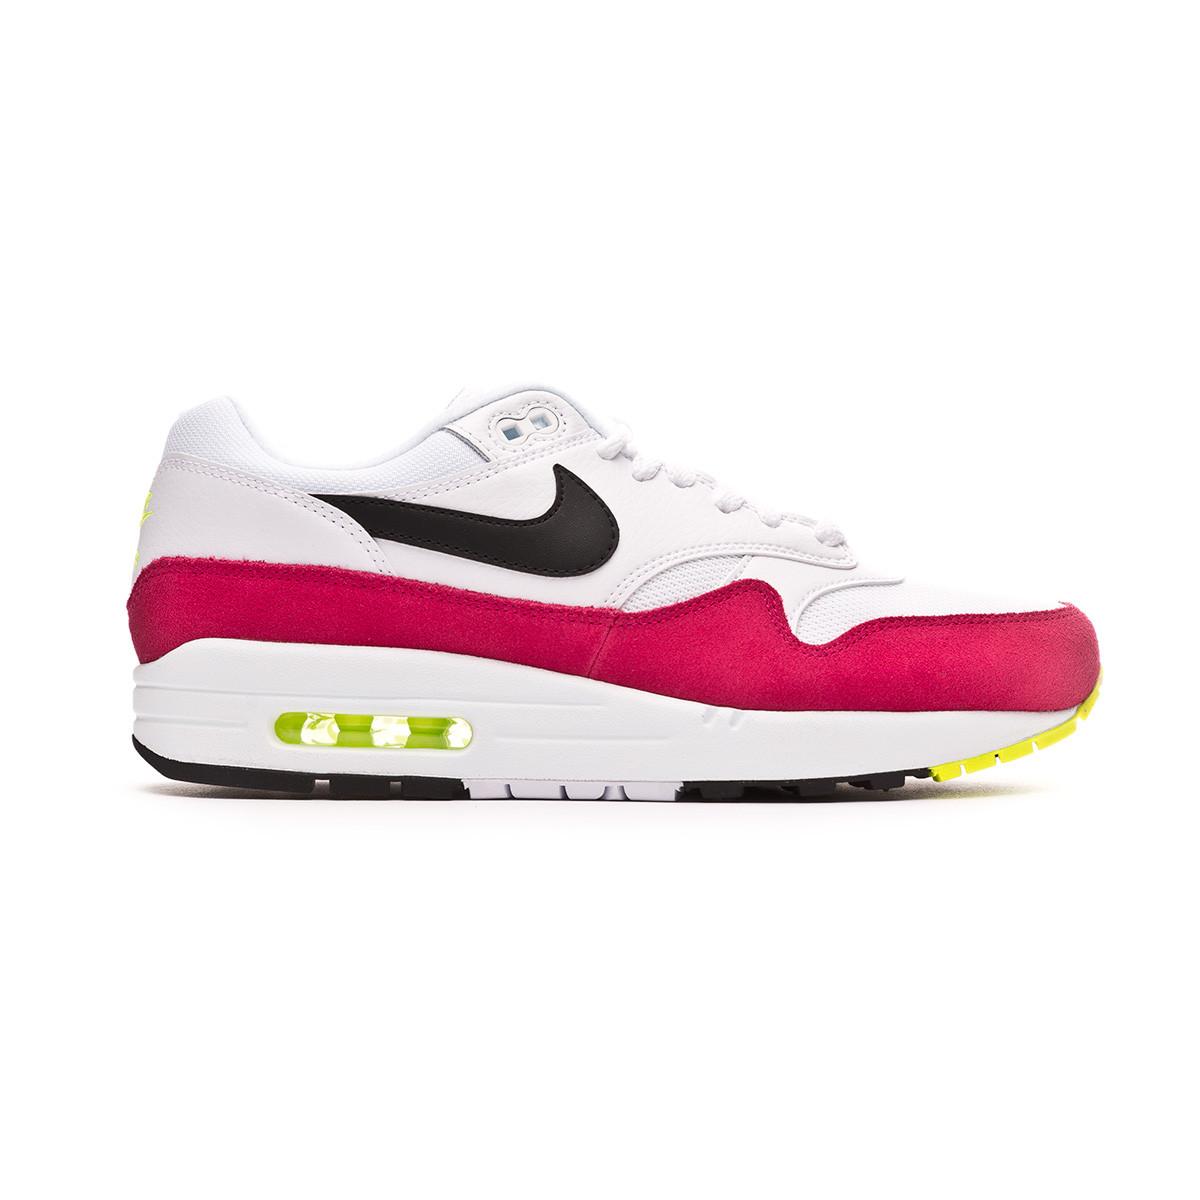 online retailer cd2d6 848cb Trainers Nike Air Max 1 White-Black-Volt-Rush pink - Tienda de fútbol  Fútbol Emotion